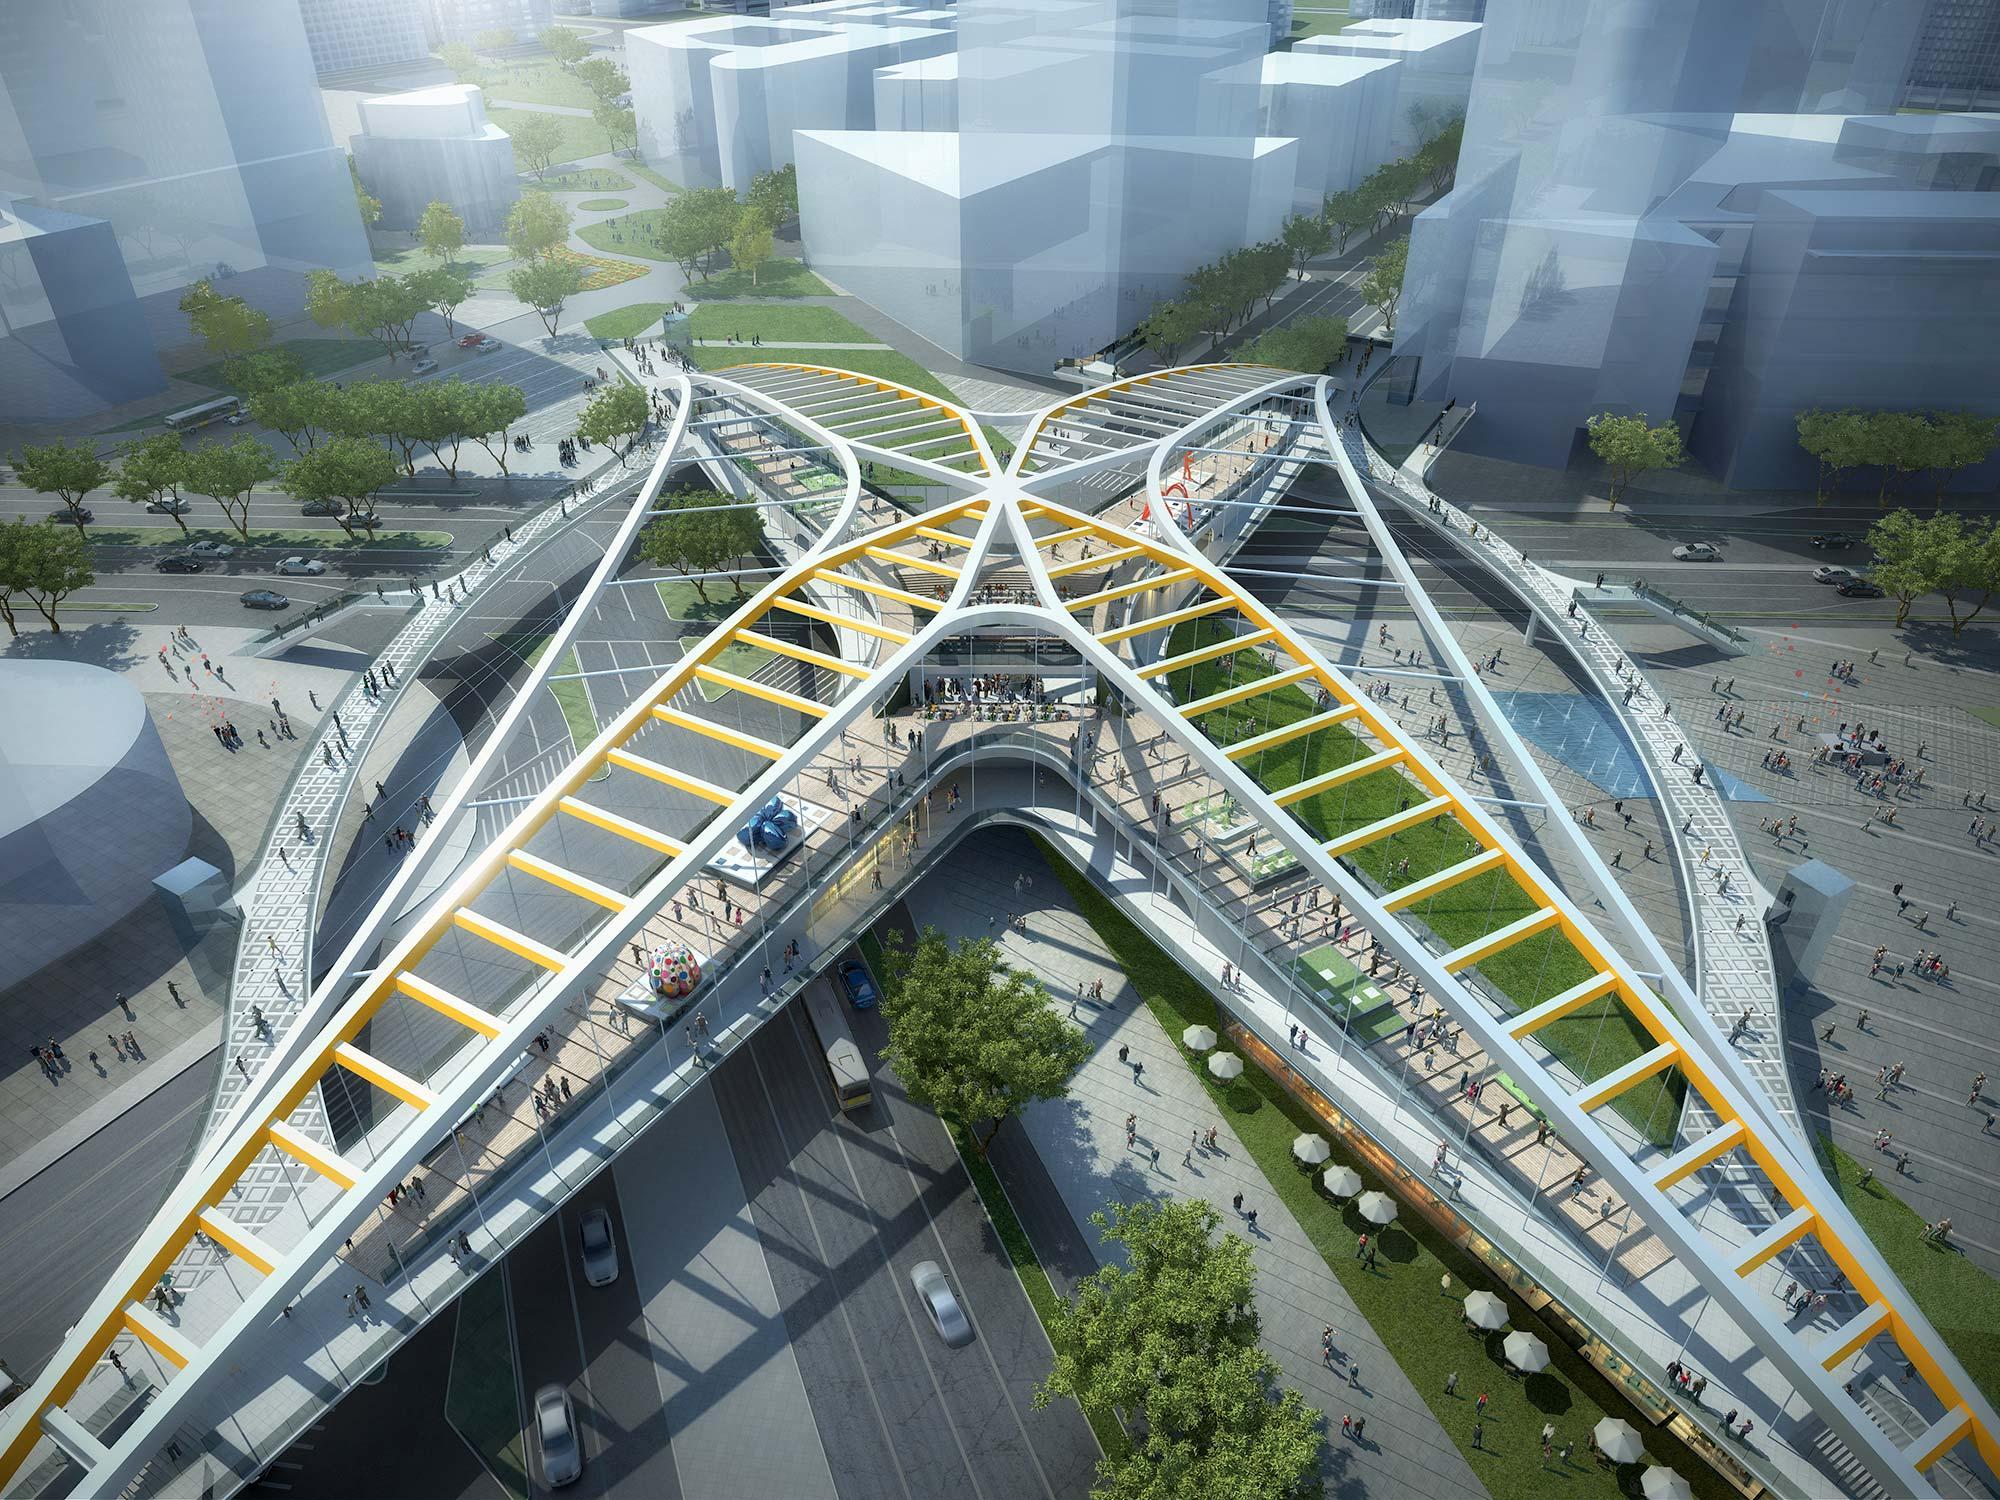 2016 design forecast community gensler for Architectural concepts pensacola florida